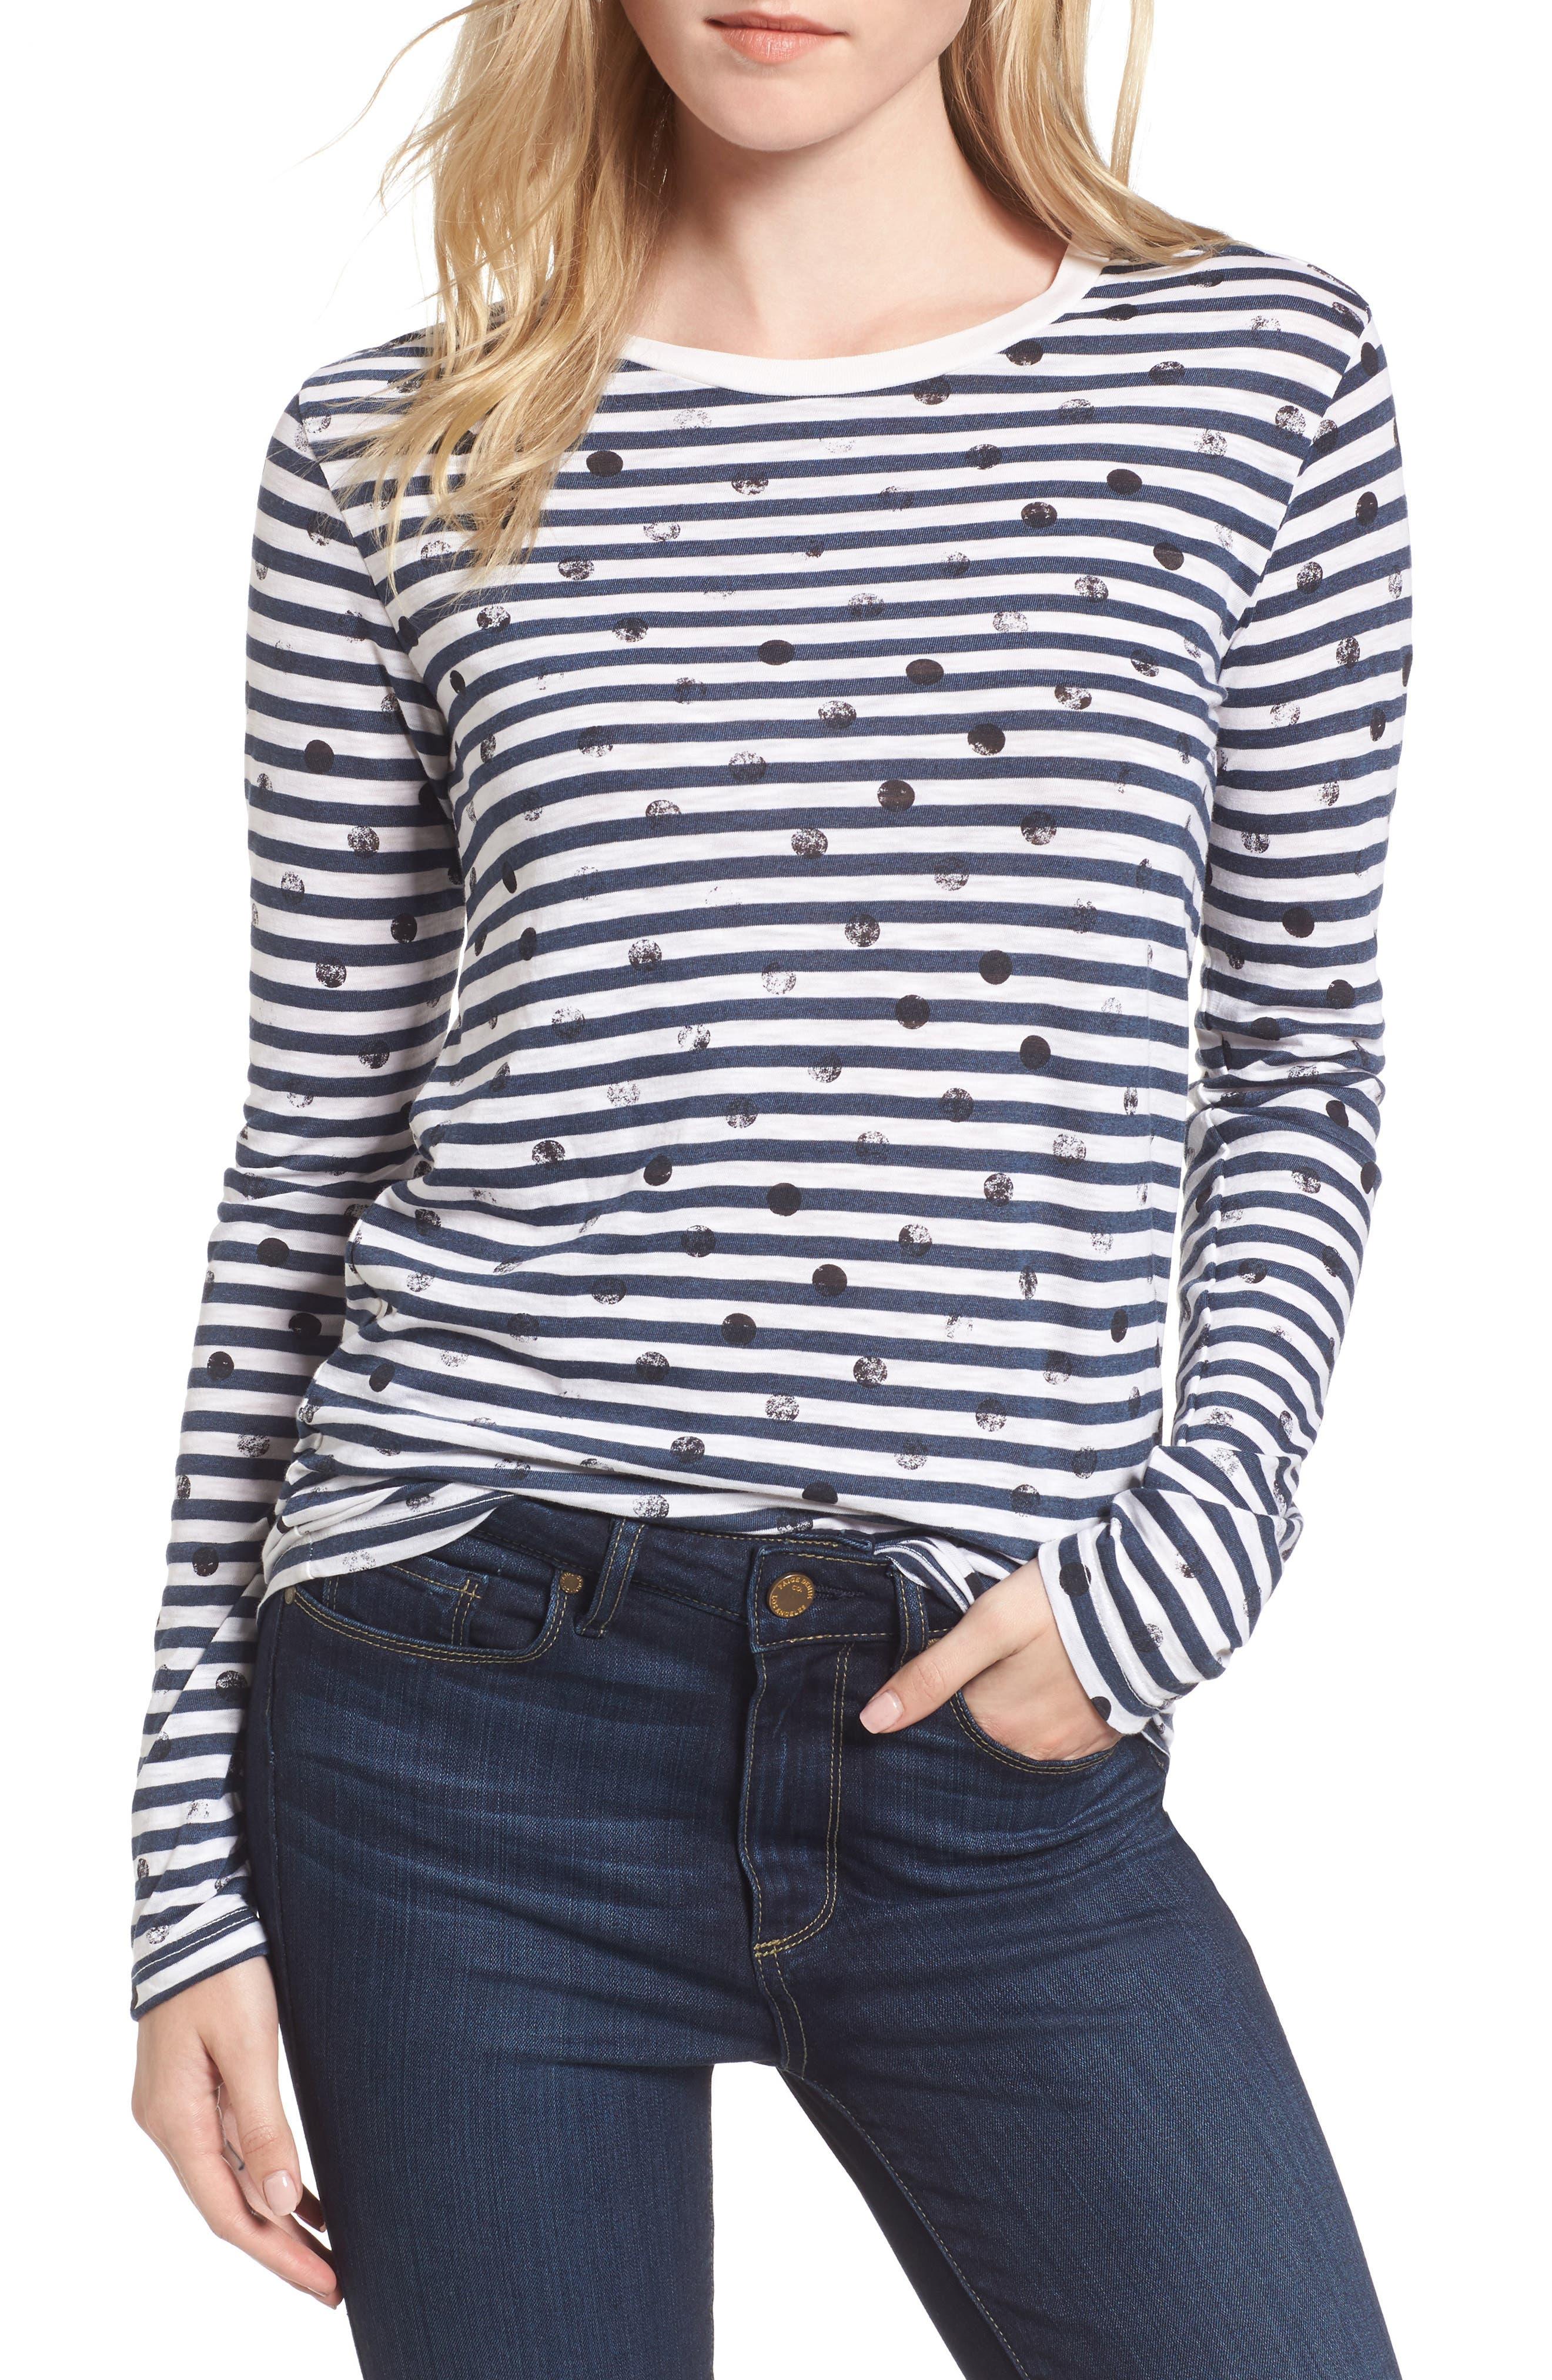 Main Image - Stateside Stripe Polka Dot Tee